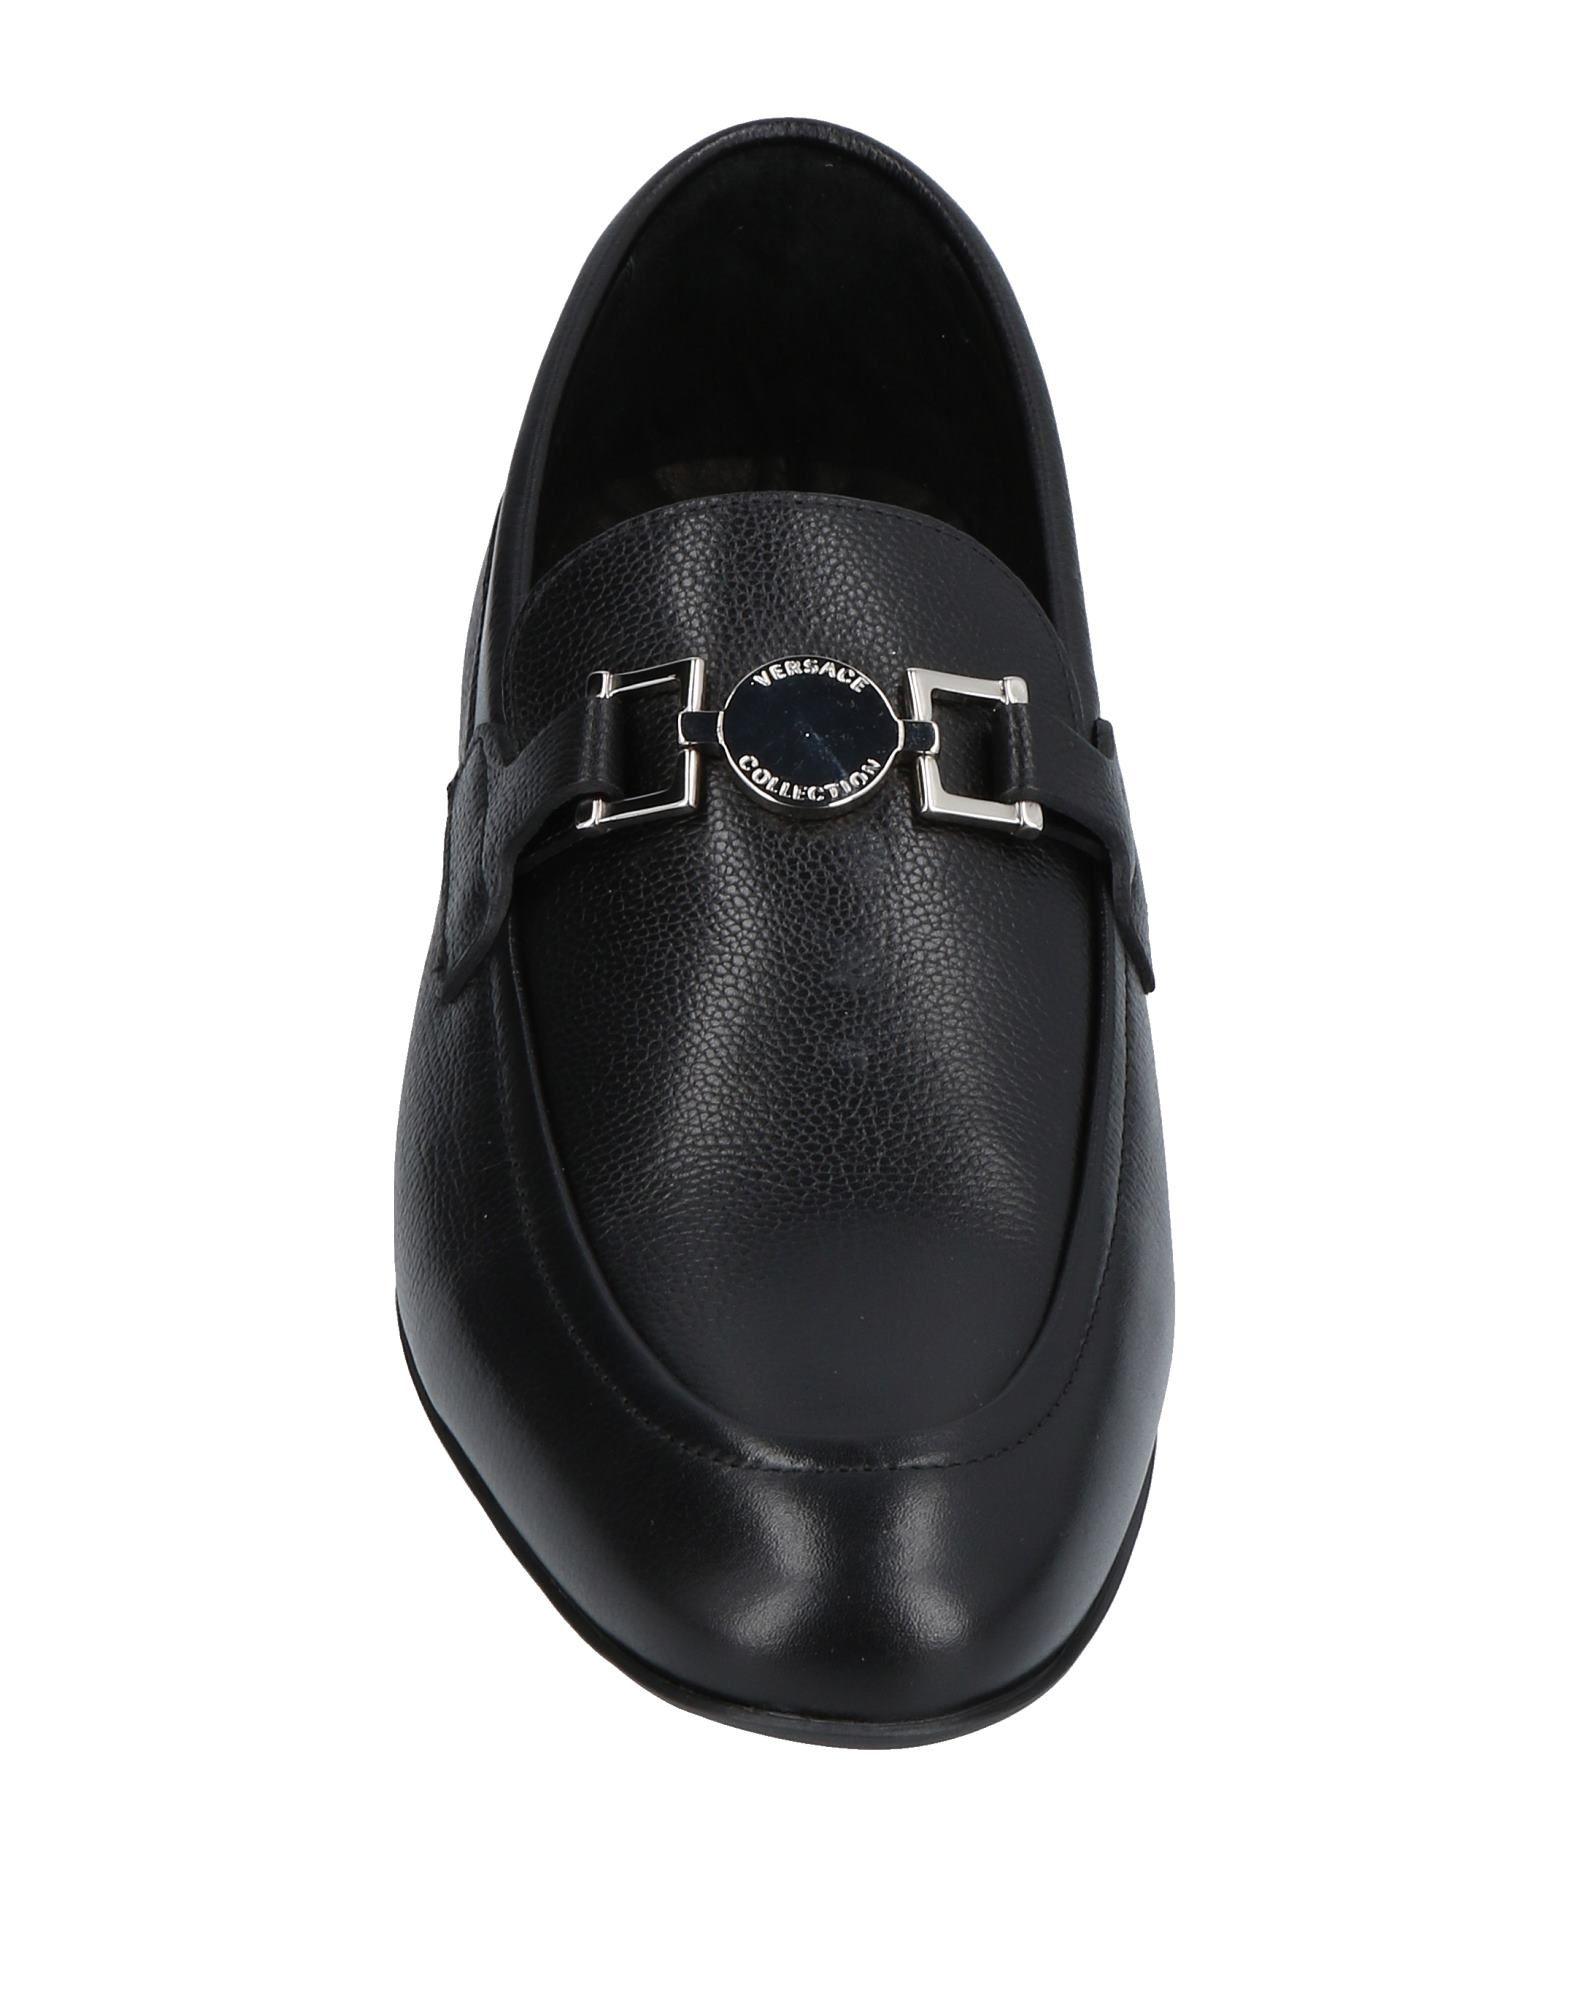 Versace Collection Mokassins Herren  11463633EB Gute Qualität beliebte Schuhe